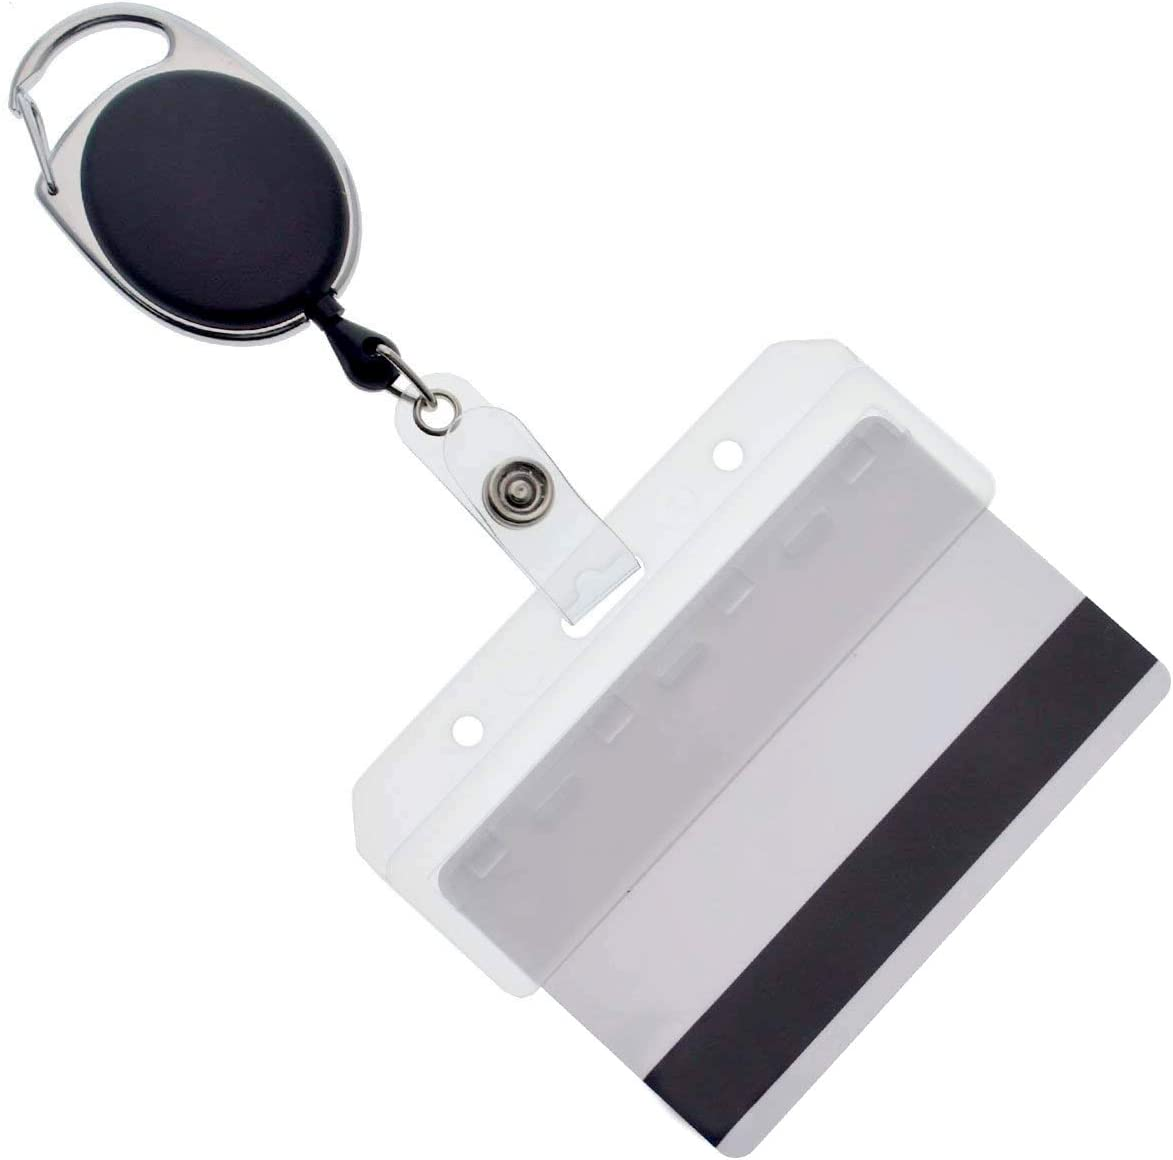 Retractable Badge Reel /& Horizontal ID Holder Combo set US Seller